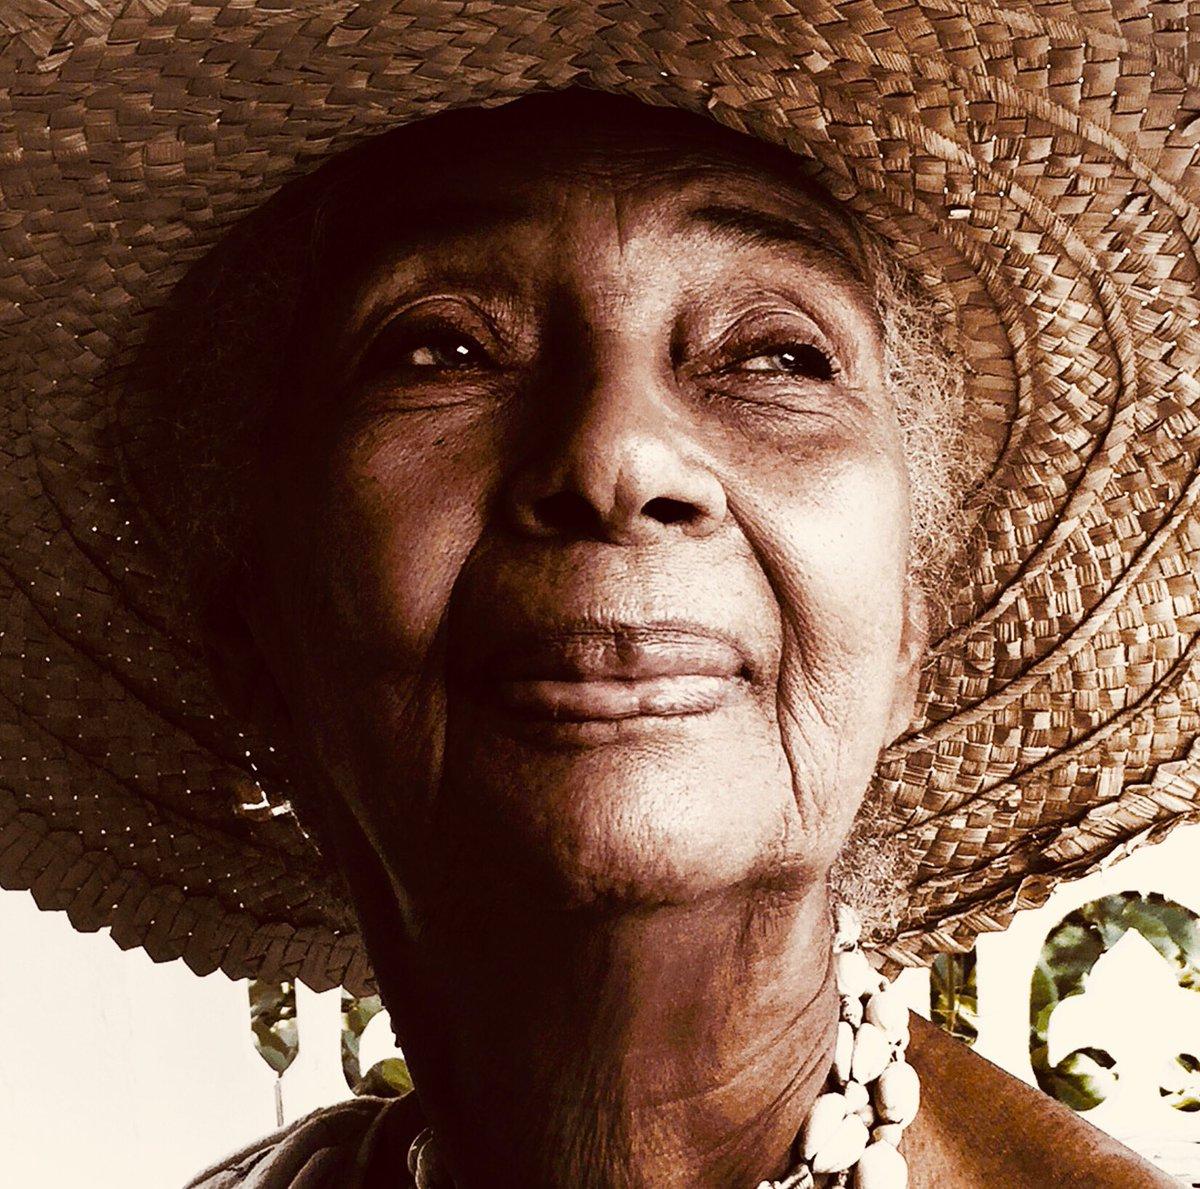 My mother Emerante de Pradines Morse photographed by #MargaretSteber #Haiti #Ayiti #Folklore #Heritage 💕💙💗